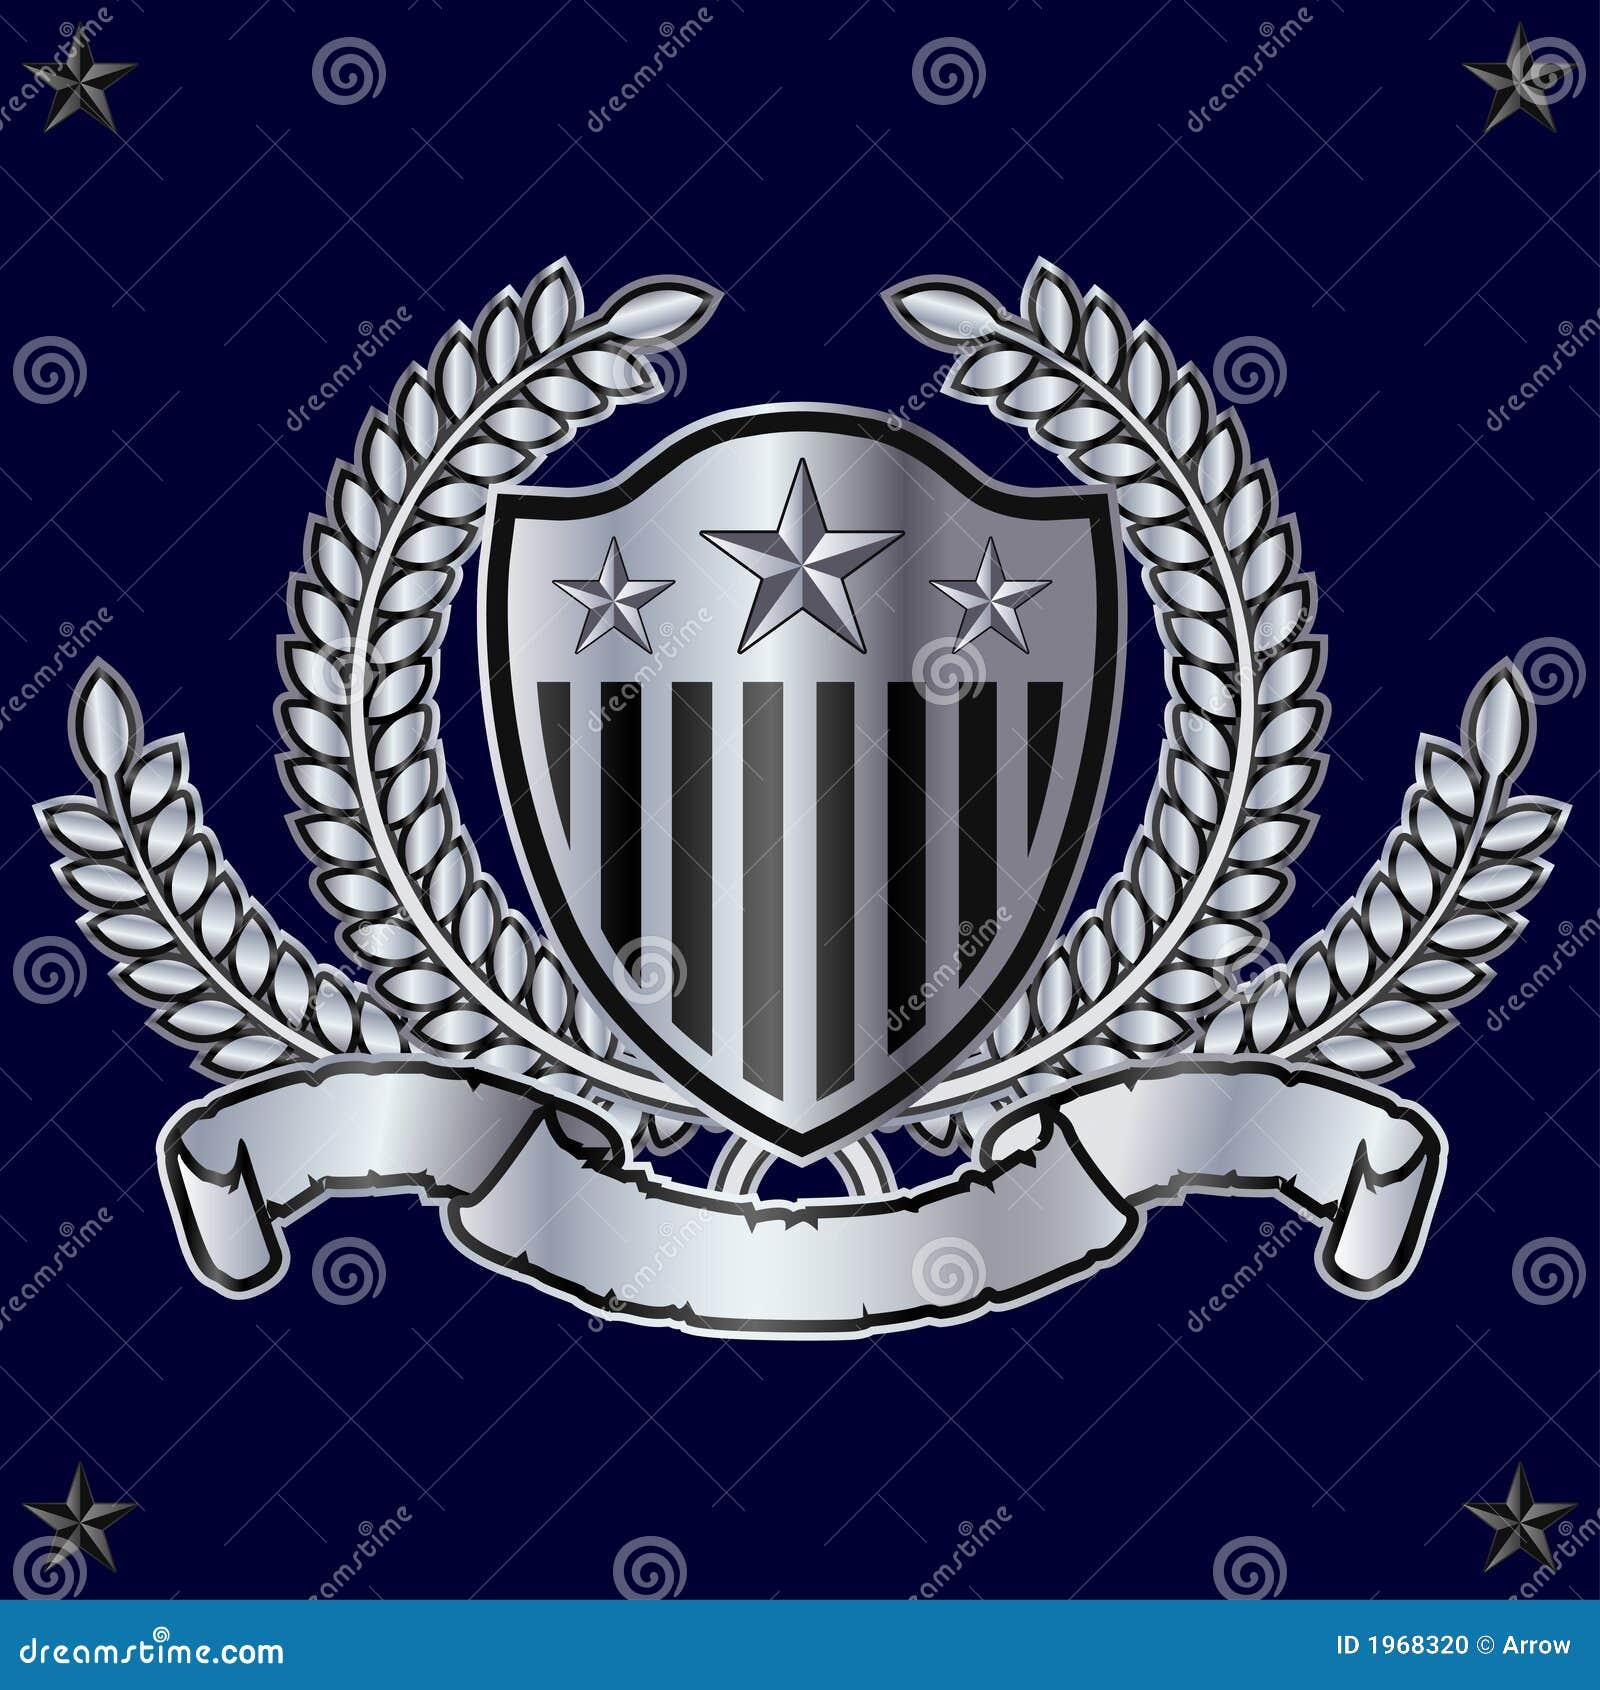 Coat of Arms 01c